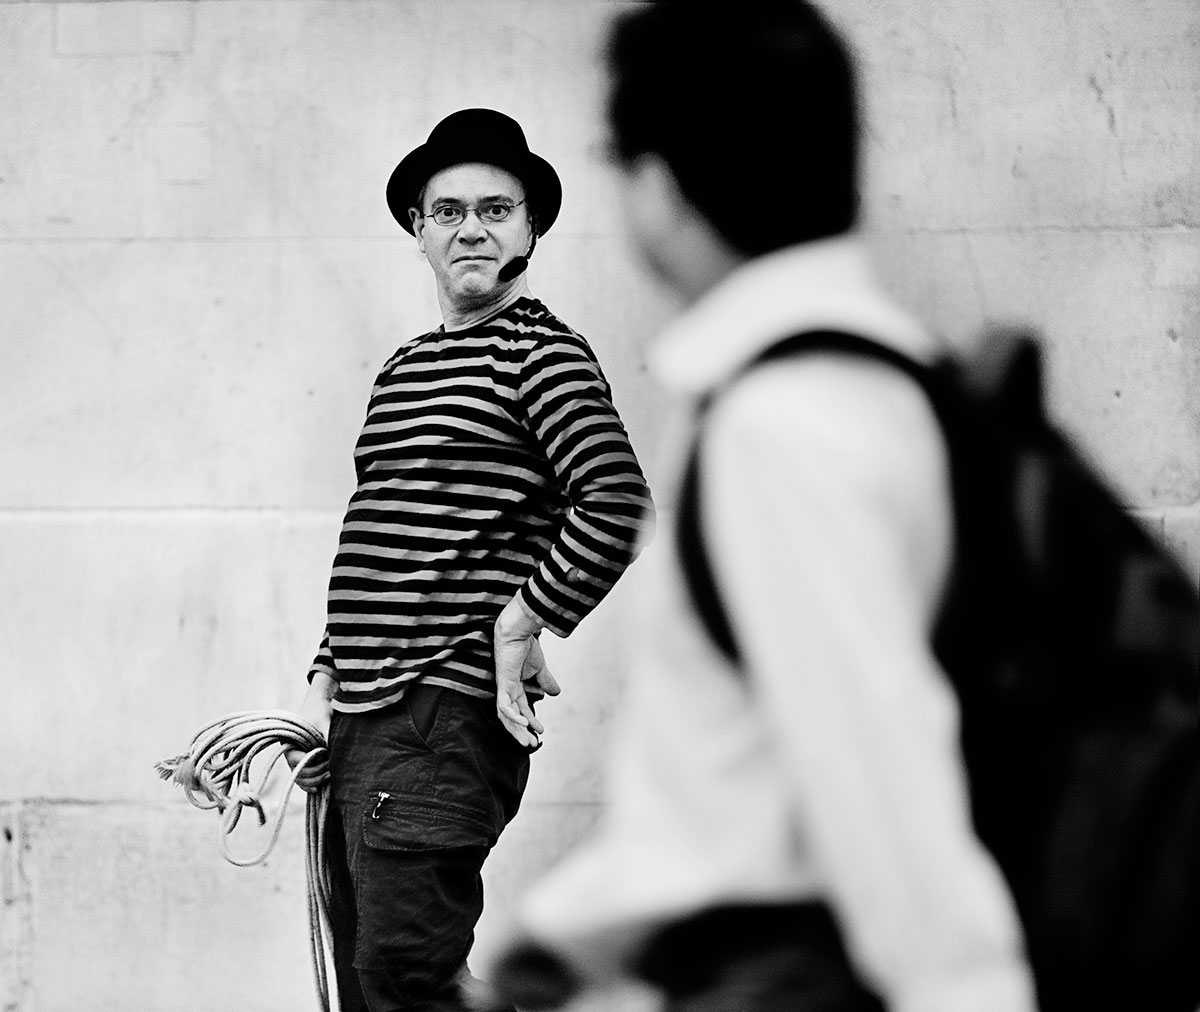 Street performer Trafalgar Sq London.